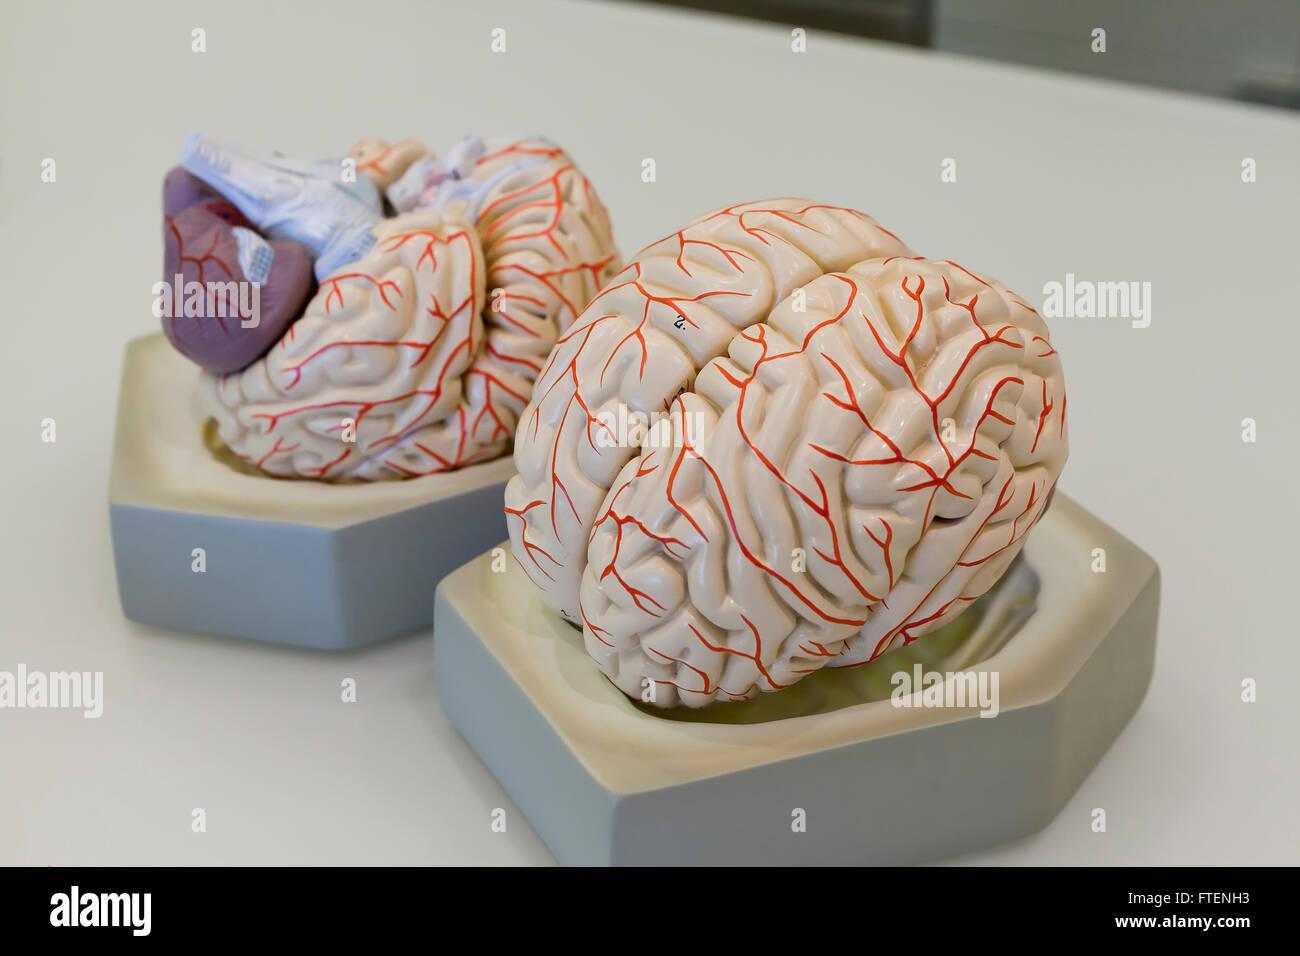 Modèle du cerveau humain - USA Photo Stock